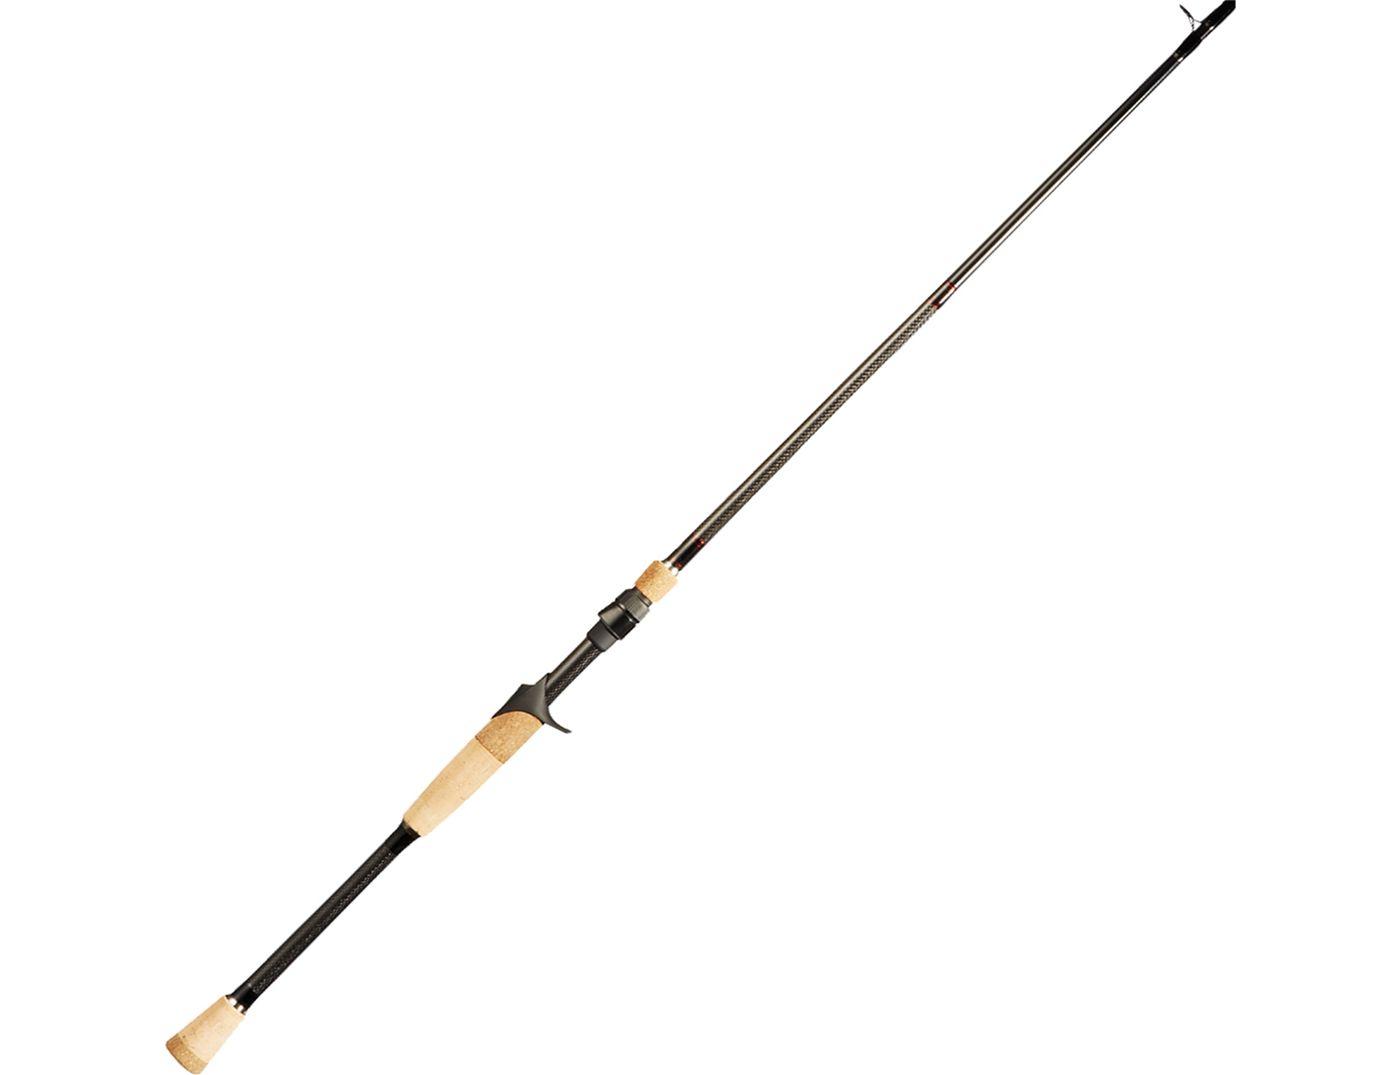 Field & Stream Tec-Spec Black Casting Rod